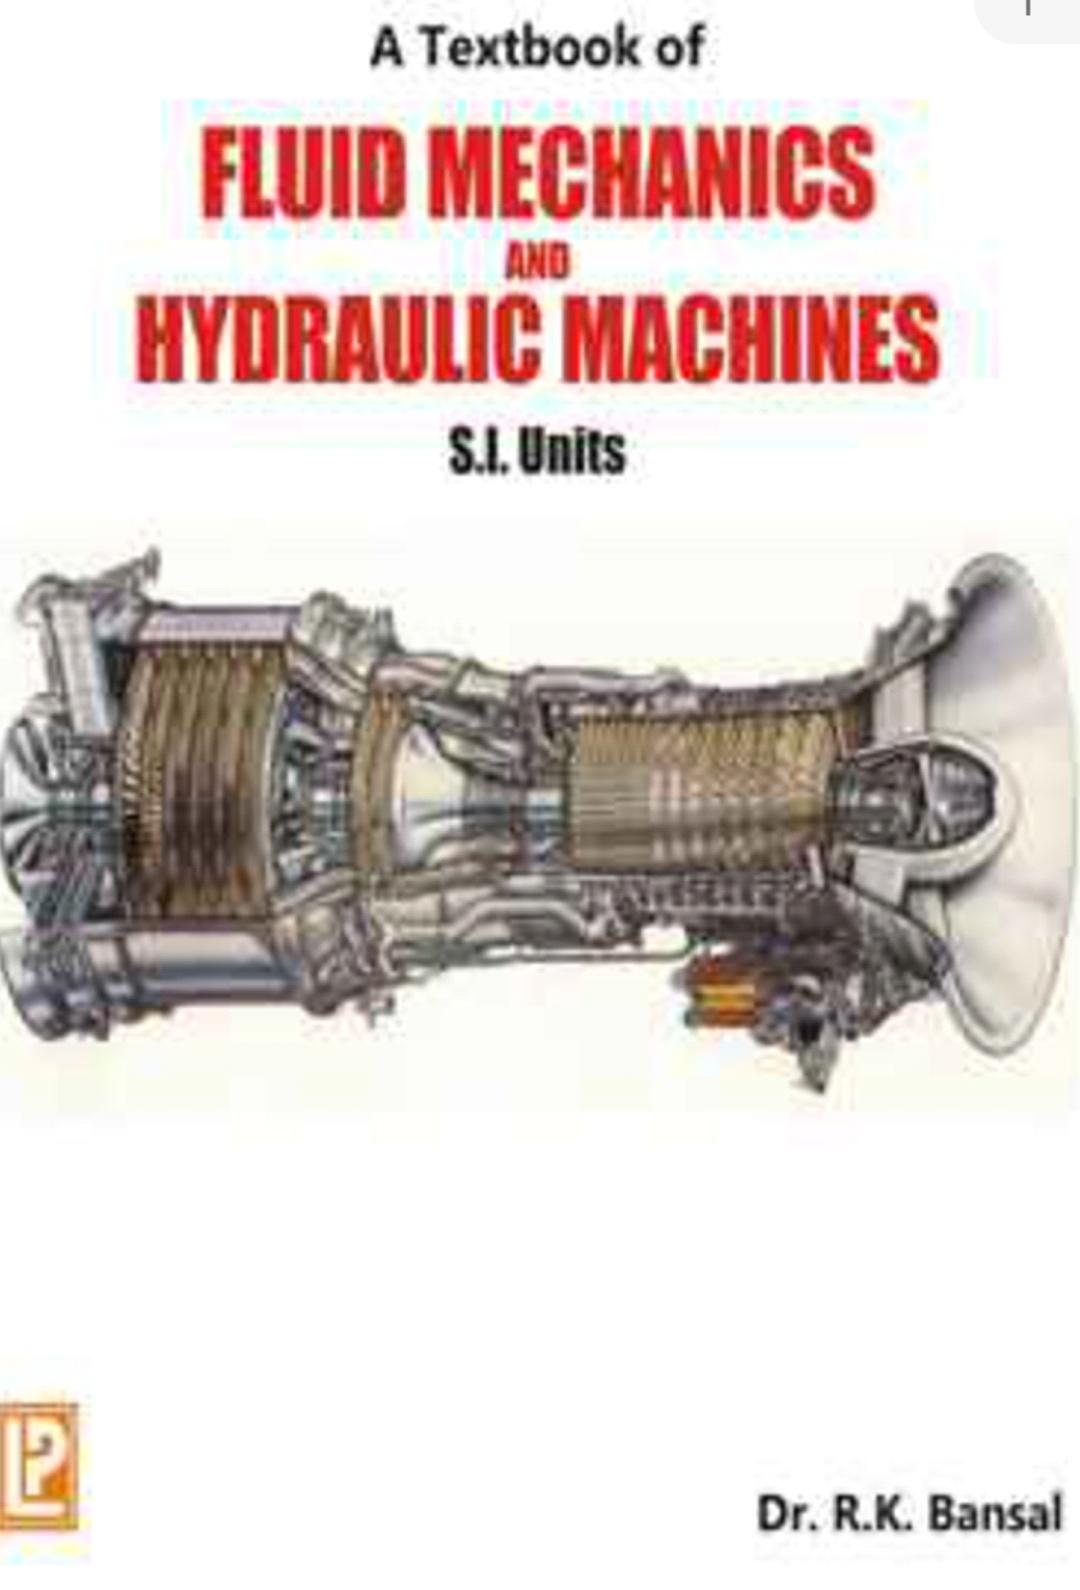 R K Bansal Fluid Mechanics and HydraulicMachines Latest Edition PDF